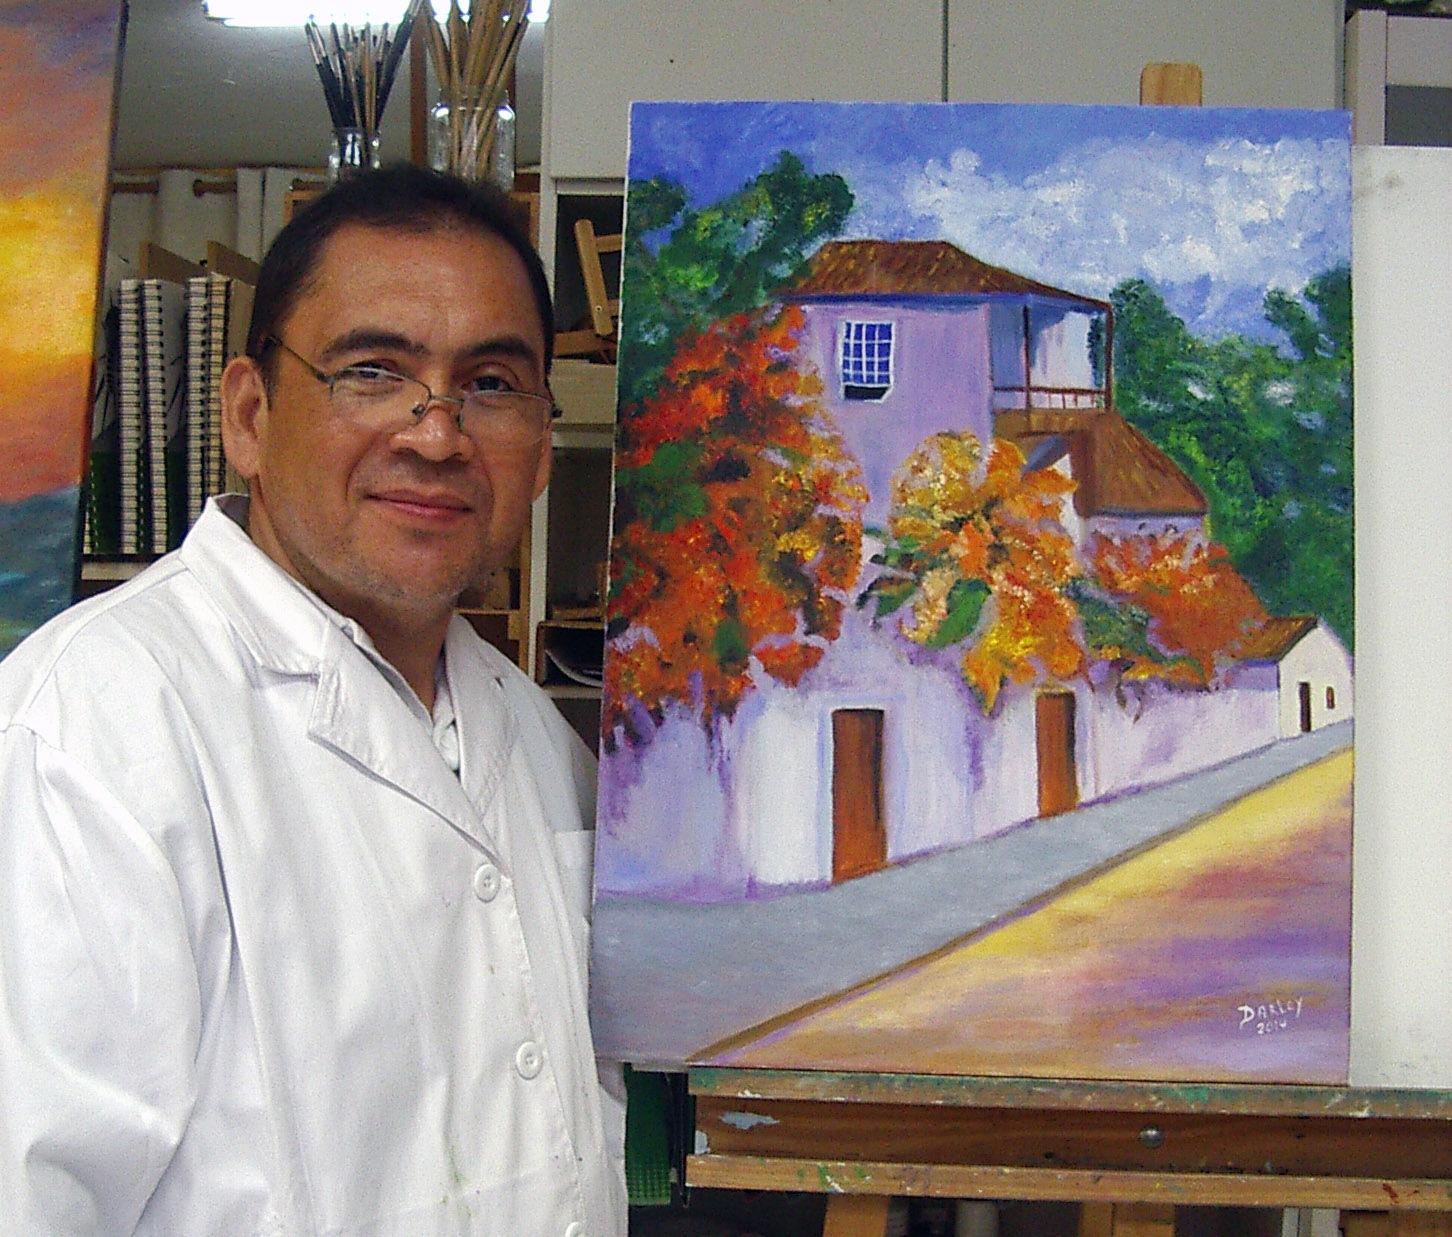 Darley, óleo sobre lienzo, curso 2015-2016